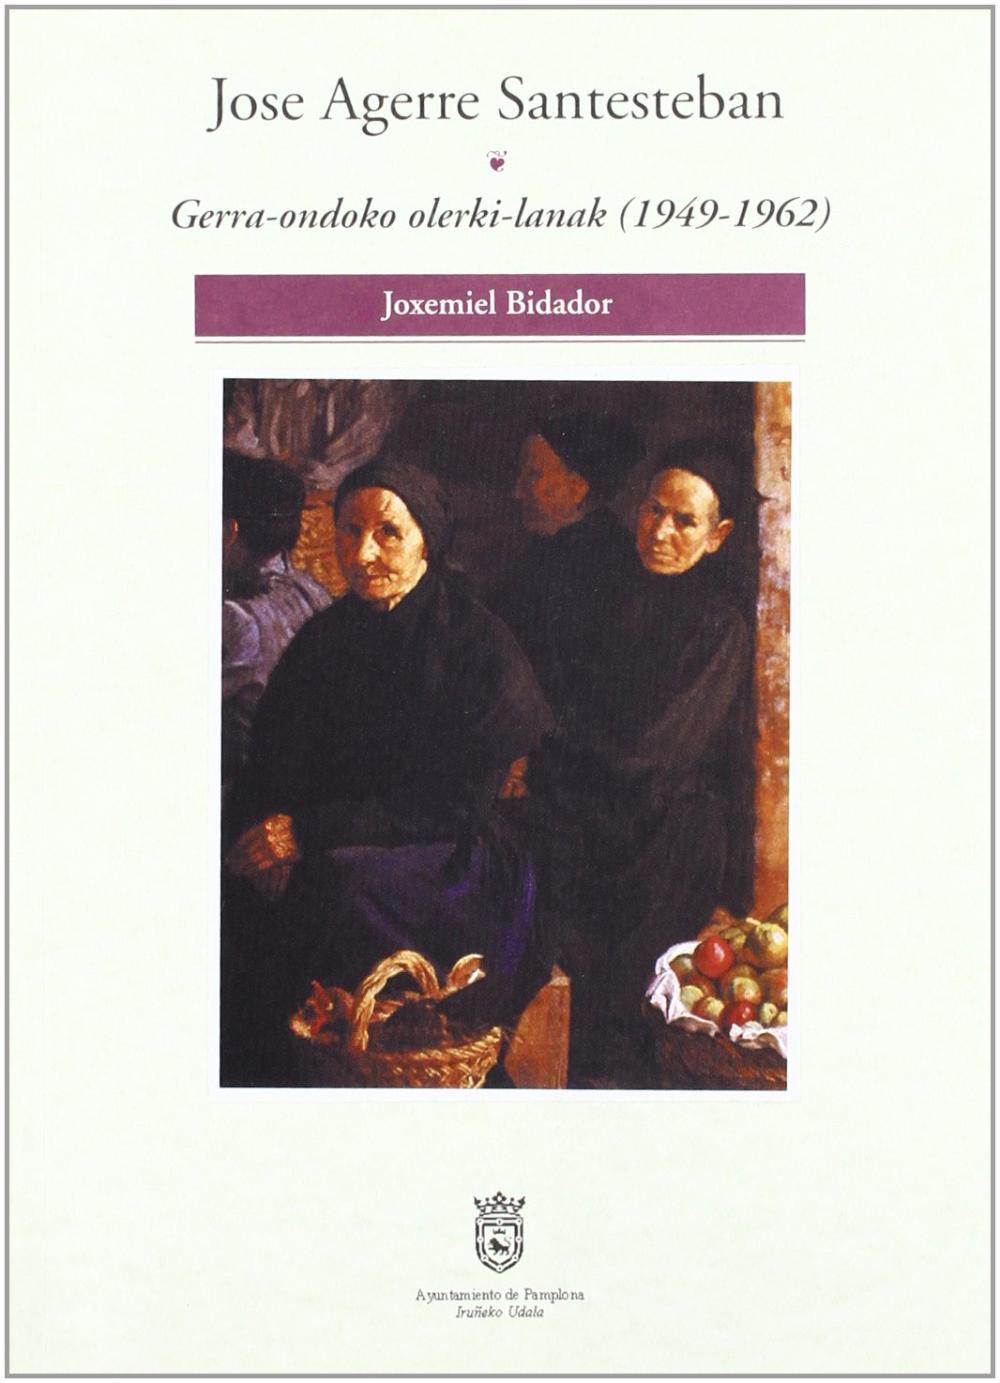 JOSE AGERRE SANTESTEBAN - GERRA ONDOKO OLERKI-LANA